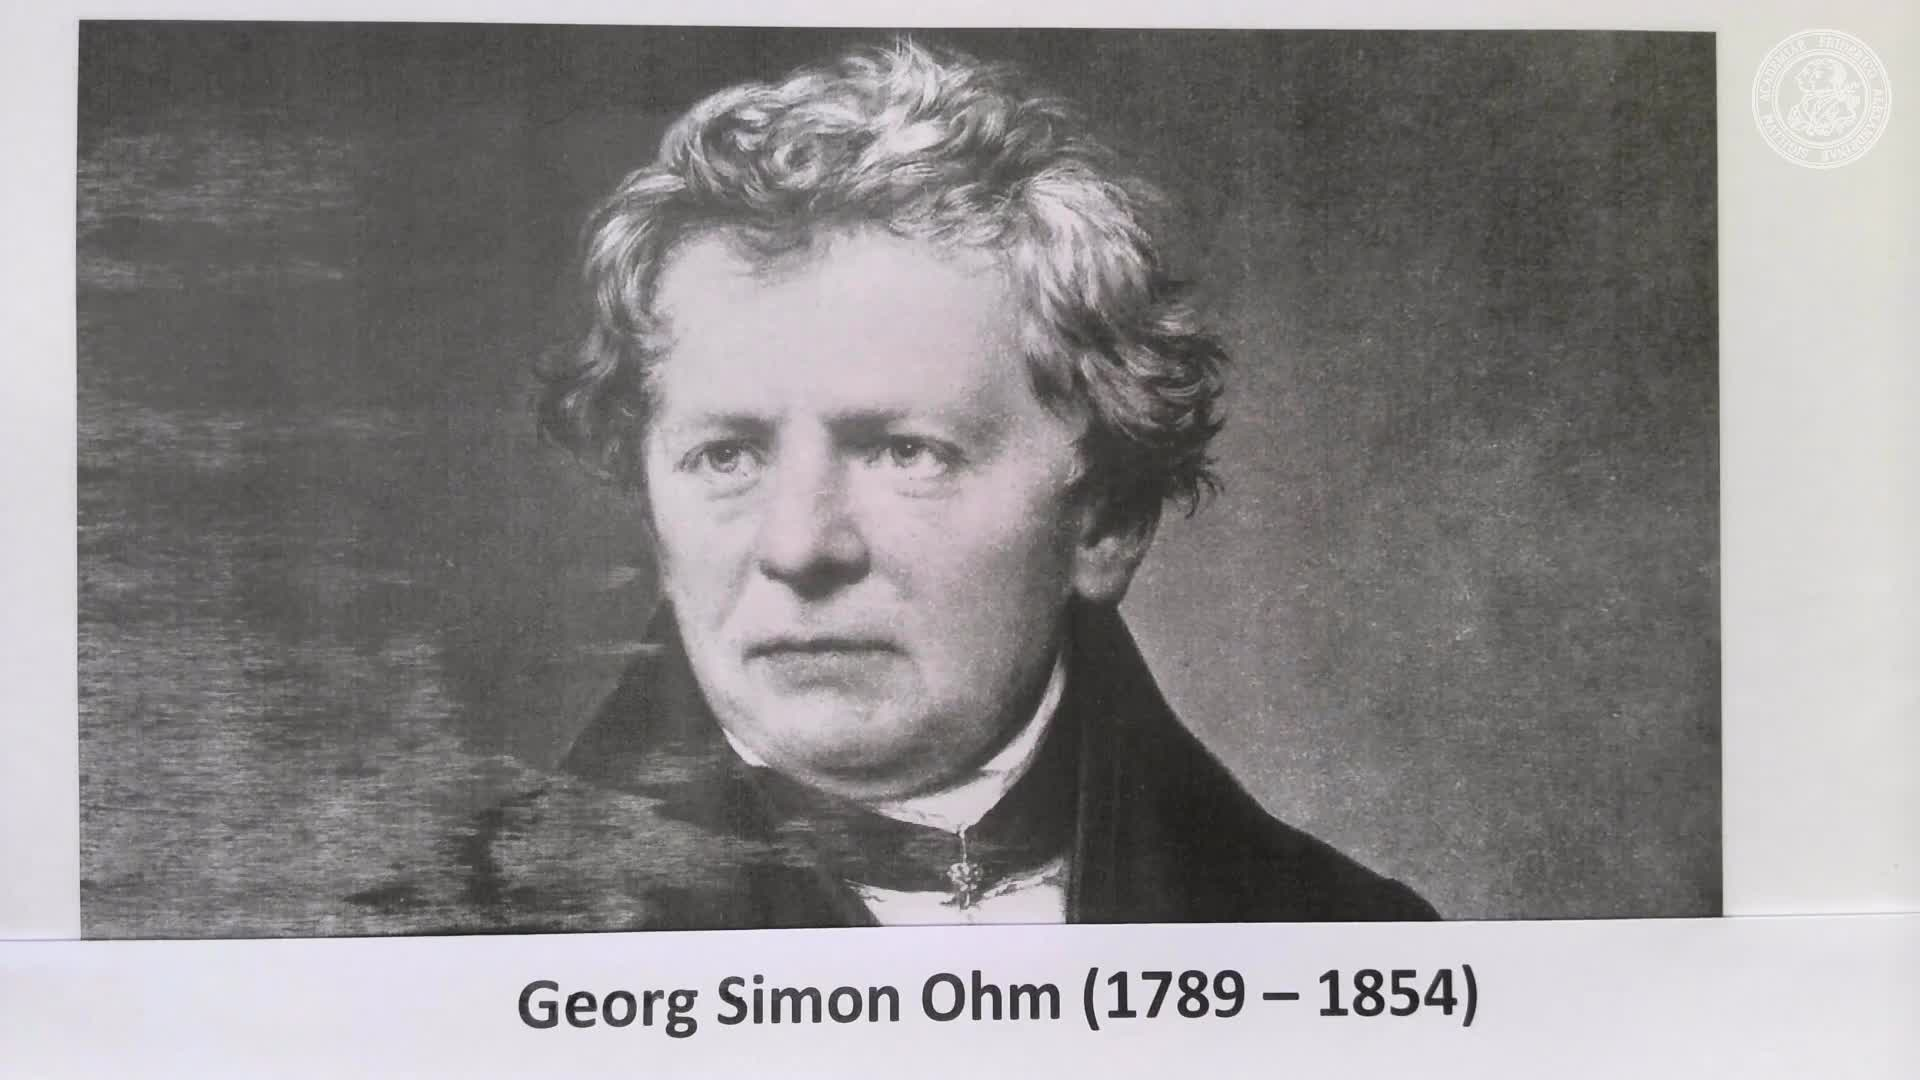 Georg Simon Ohm preview image